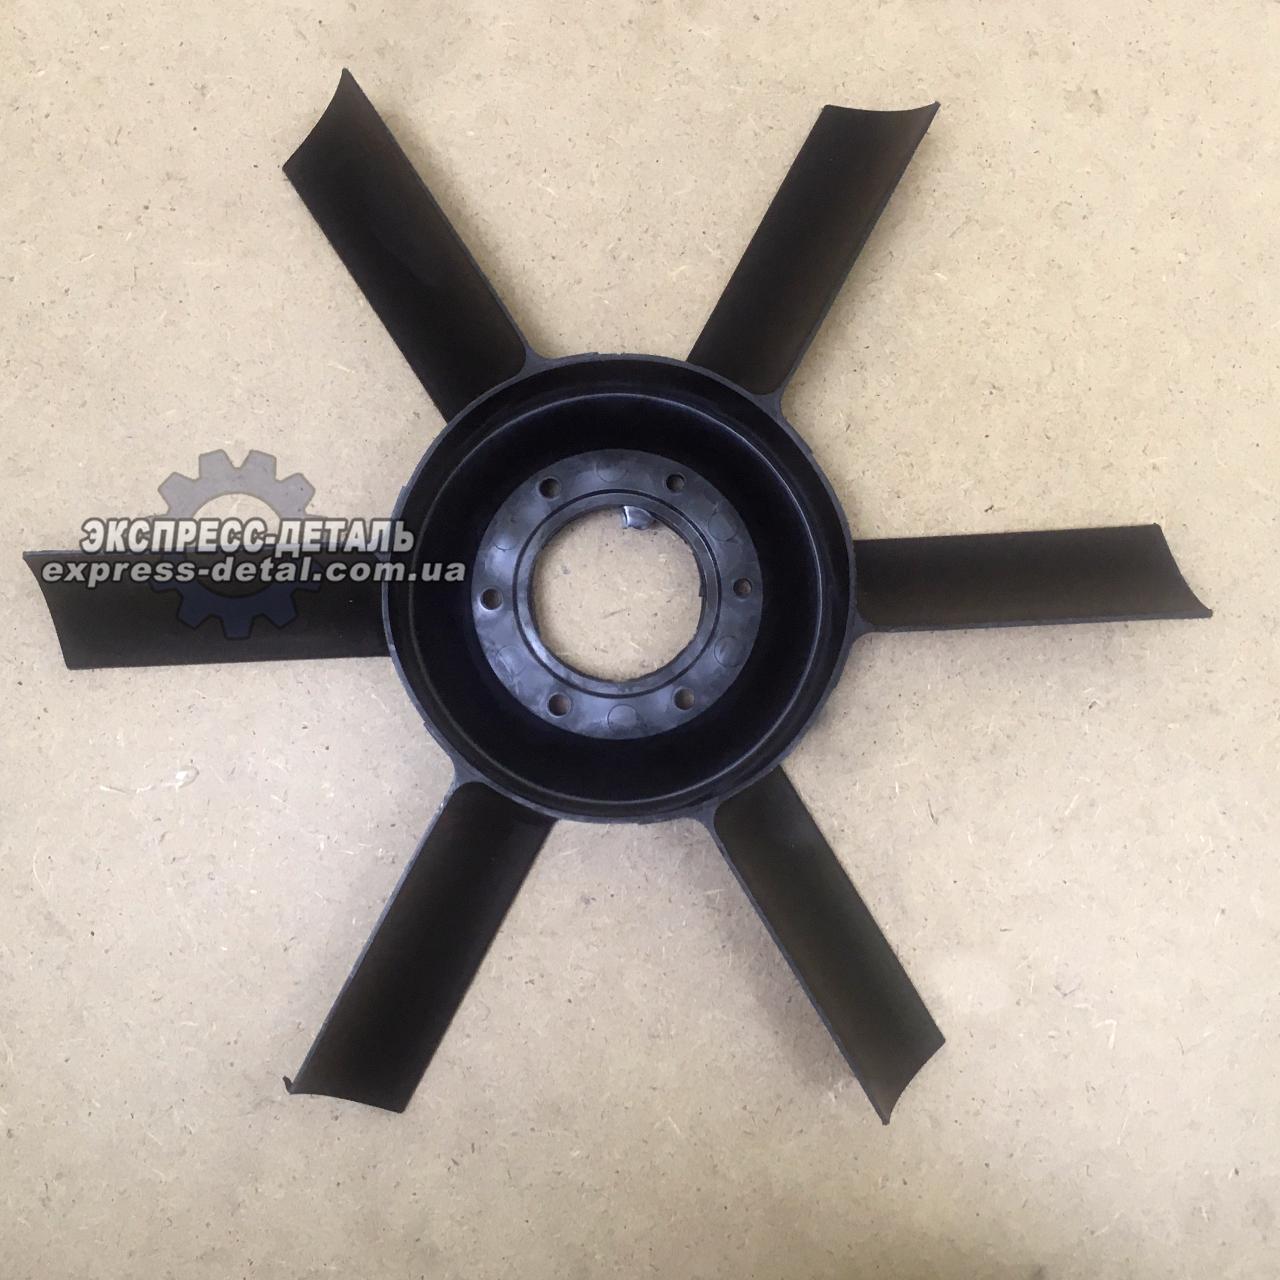 Крильчатка вентилятор МТЗ (пластик) │ 245-1308010-01